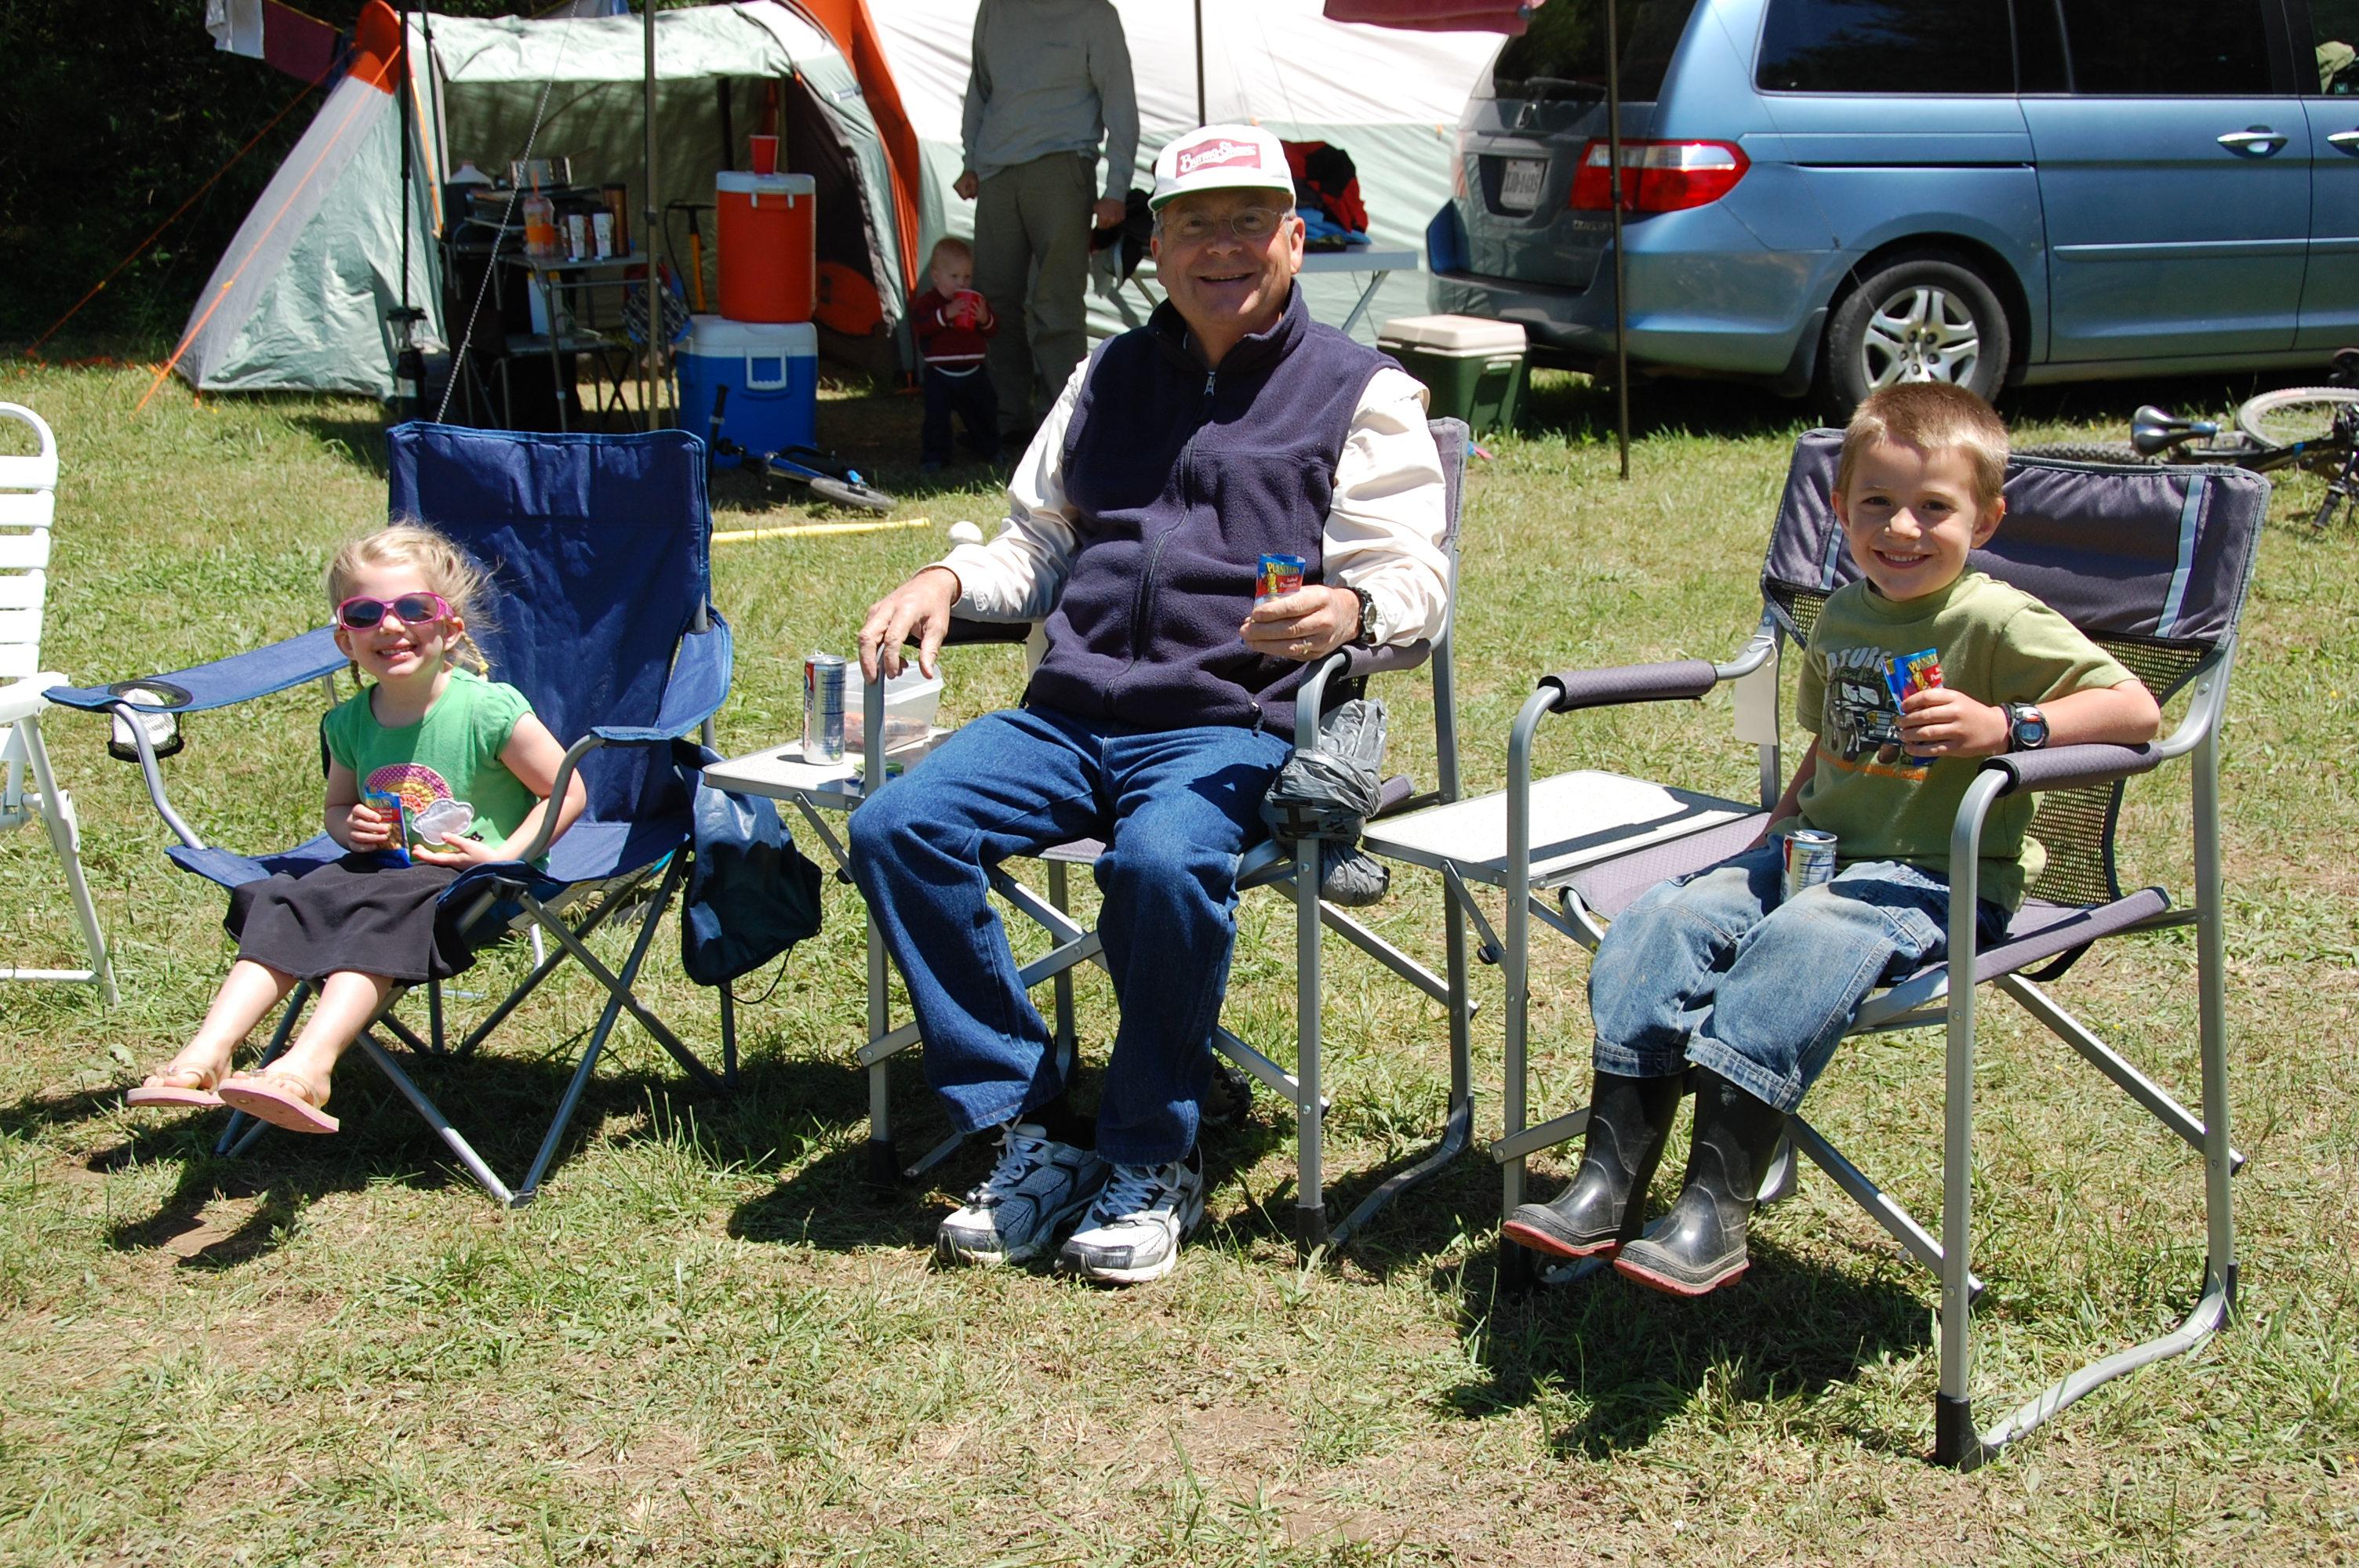 Snack time with Granddad. Kaylin & Bryant love Granddad's peanuts.